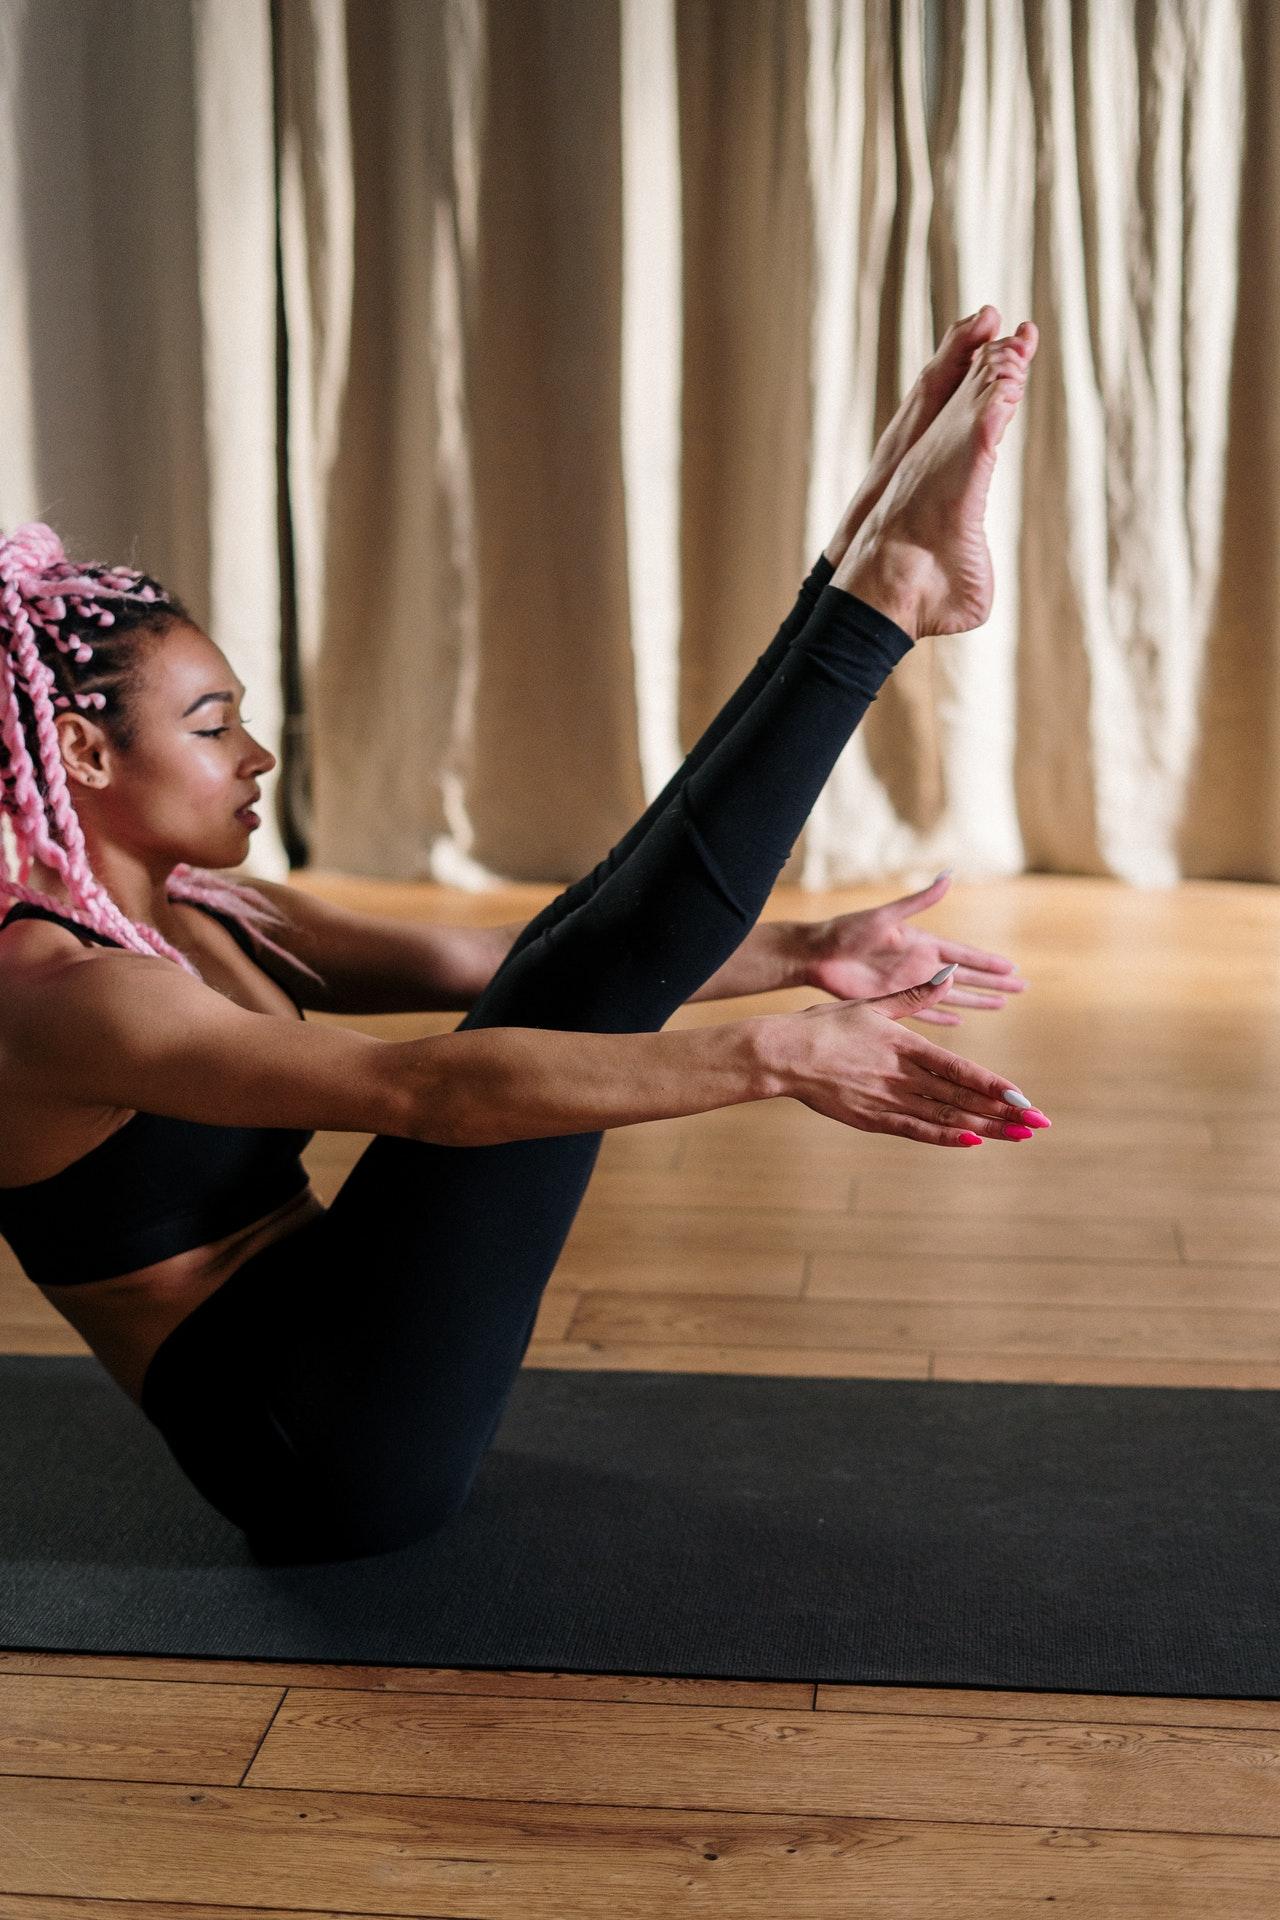 black-woman-yoga-exercising-at-home